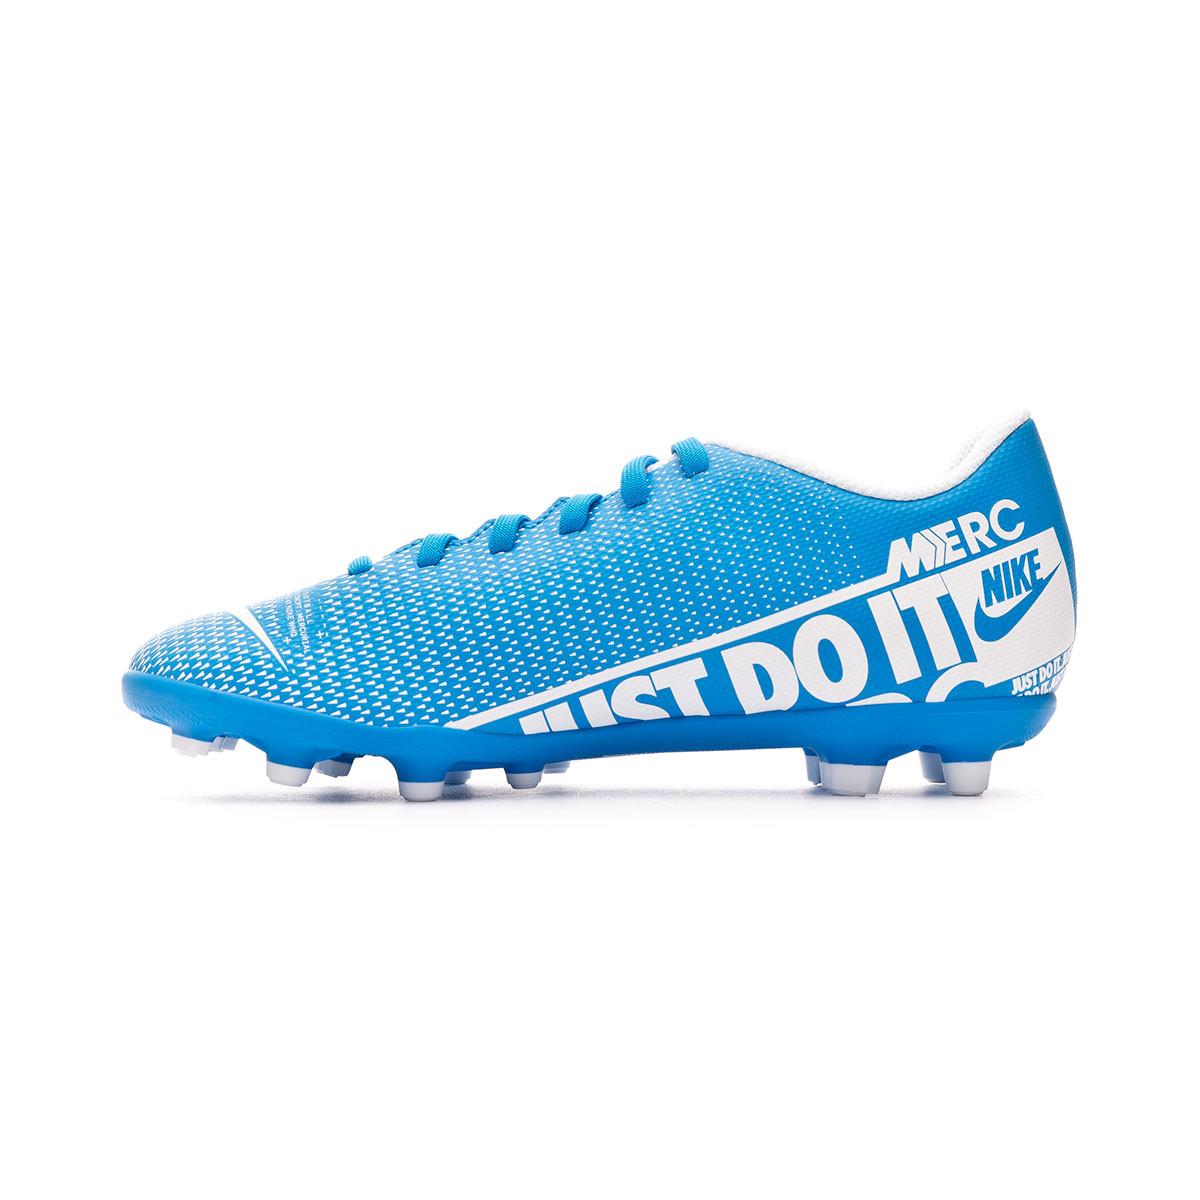 Chaussure de foot Nike Mercurial Vapor XIII Club FGMG Enfant